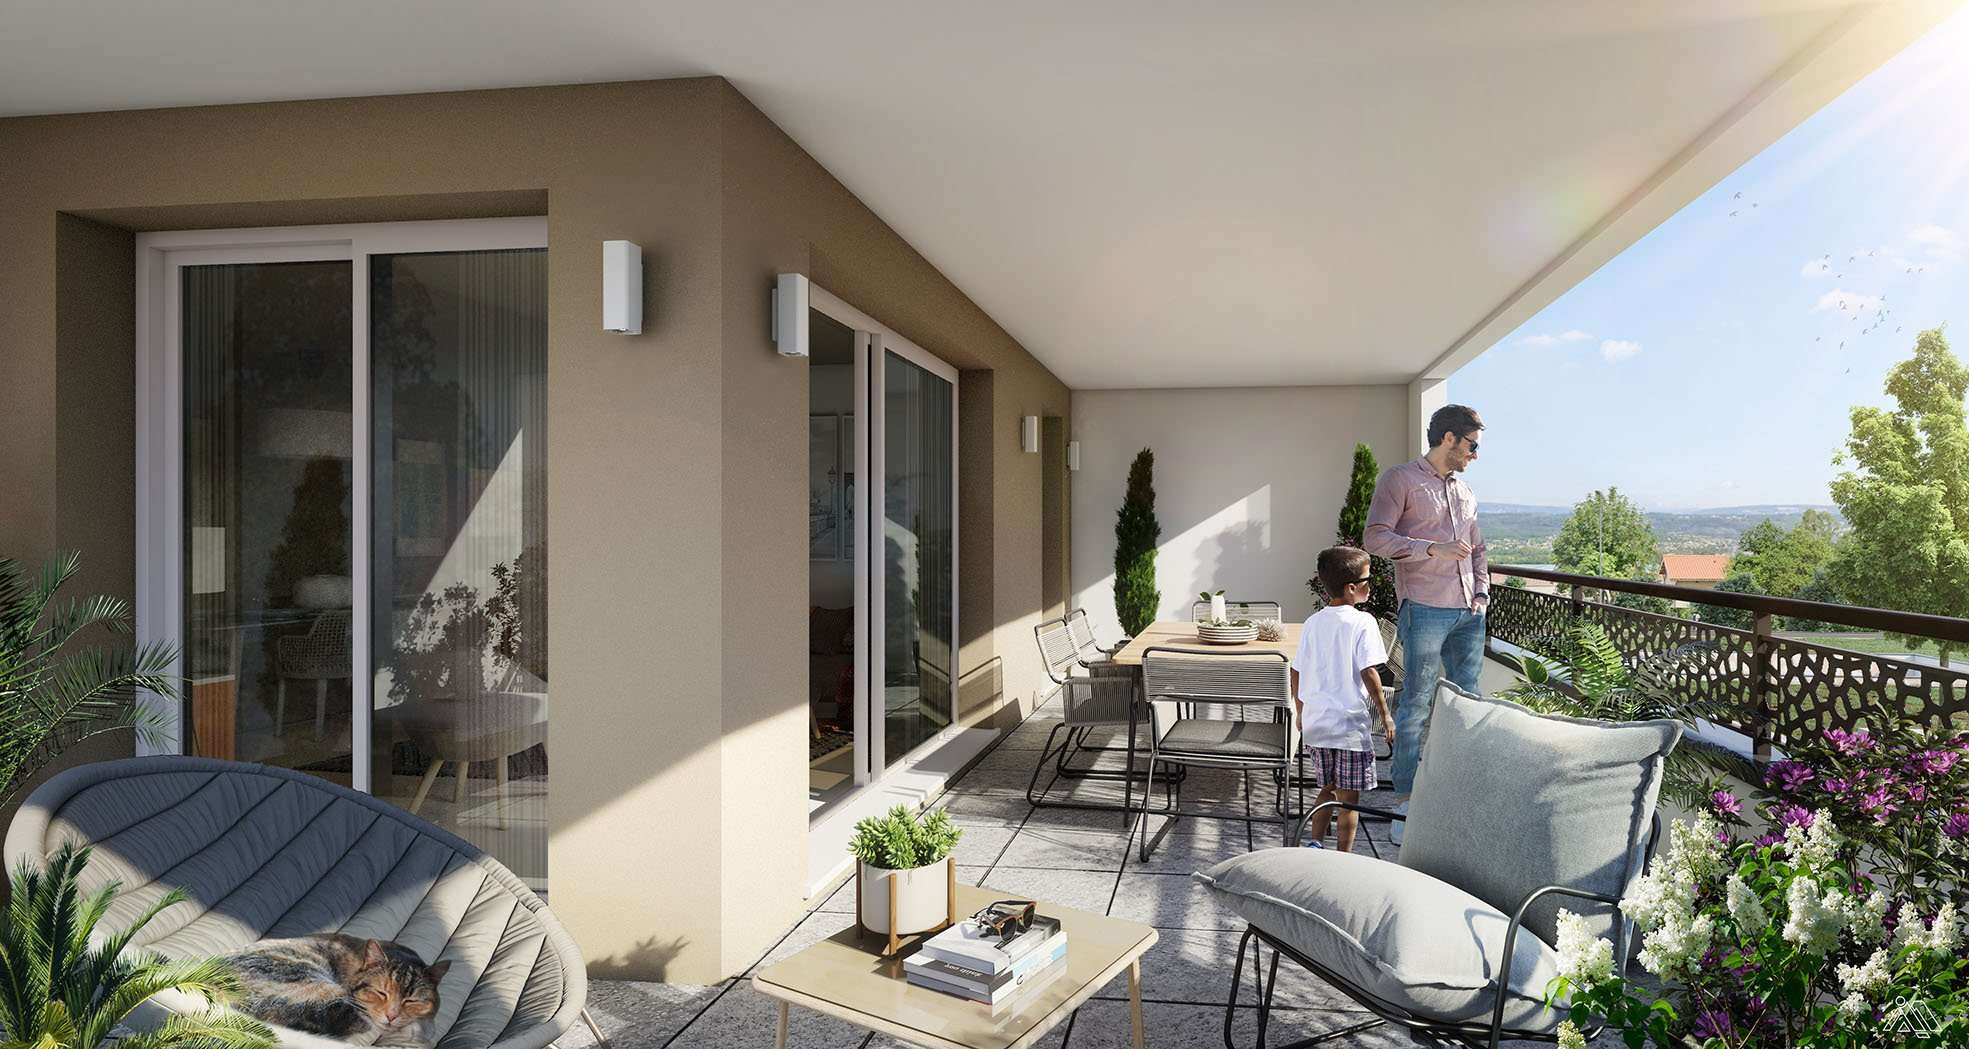 Programme Immobilier Habitat Dauphinois Clos Guigal